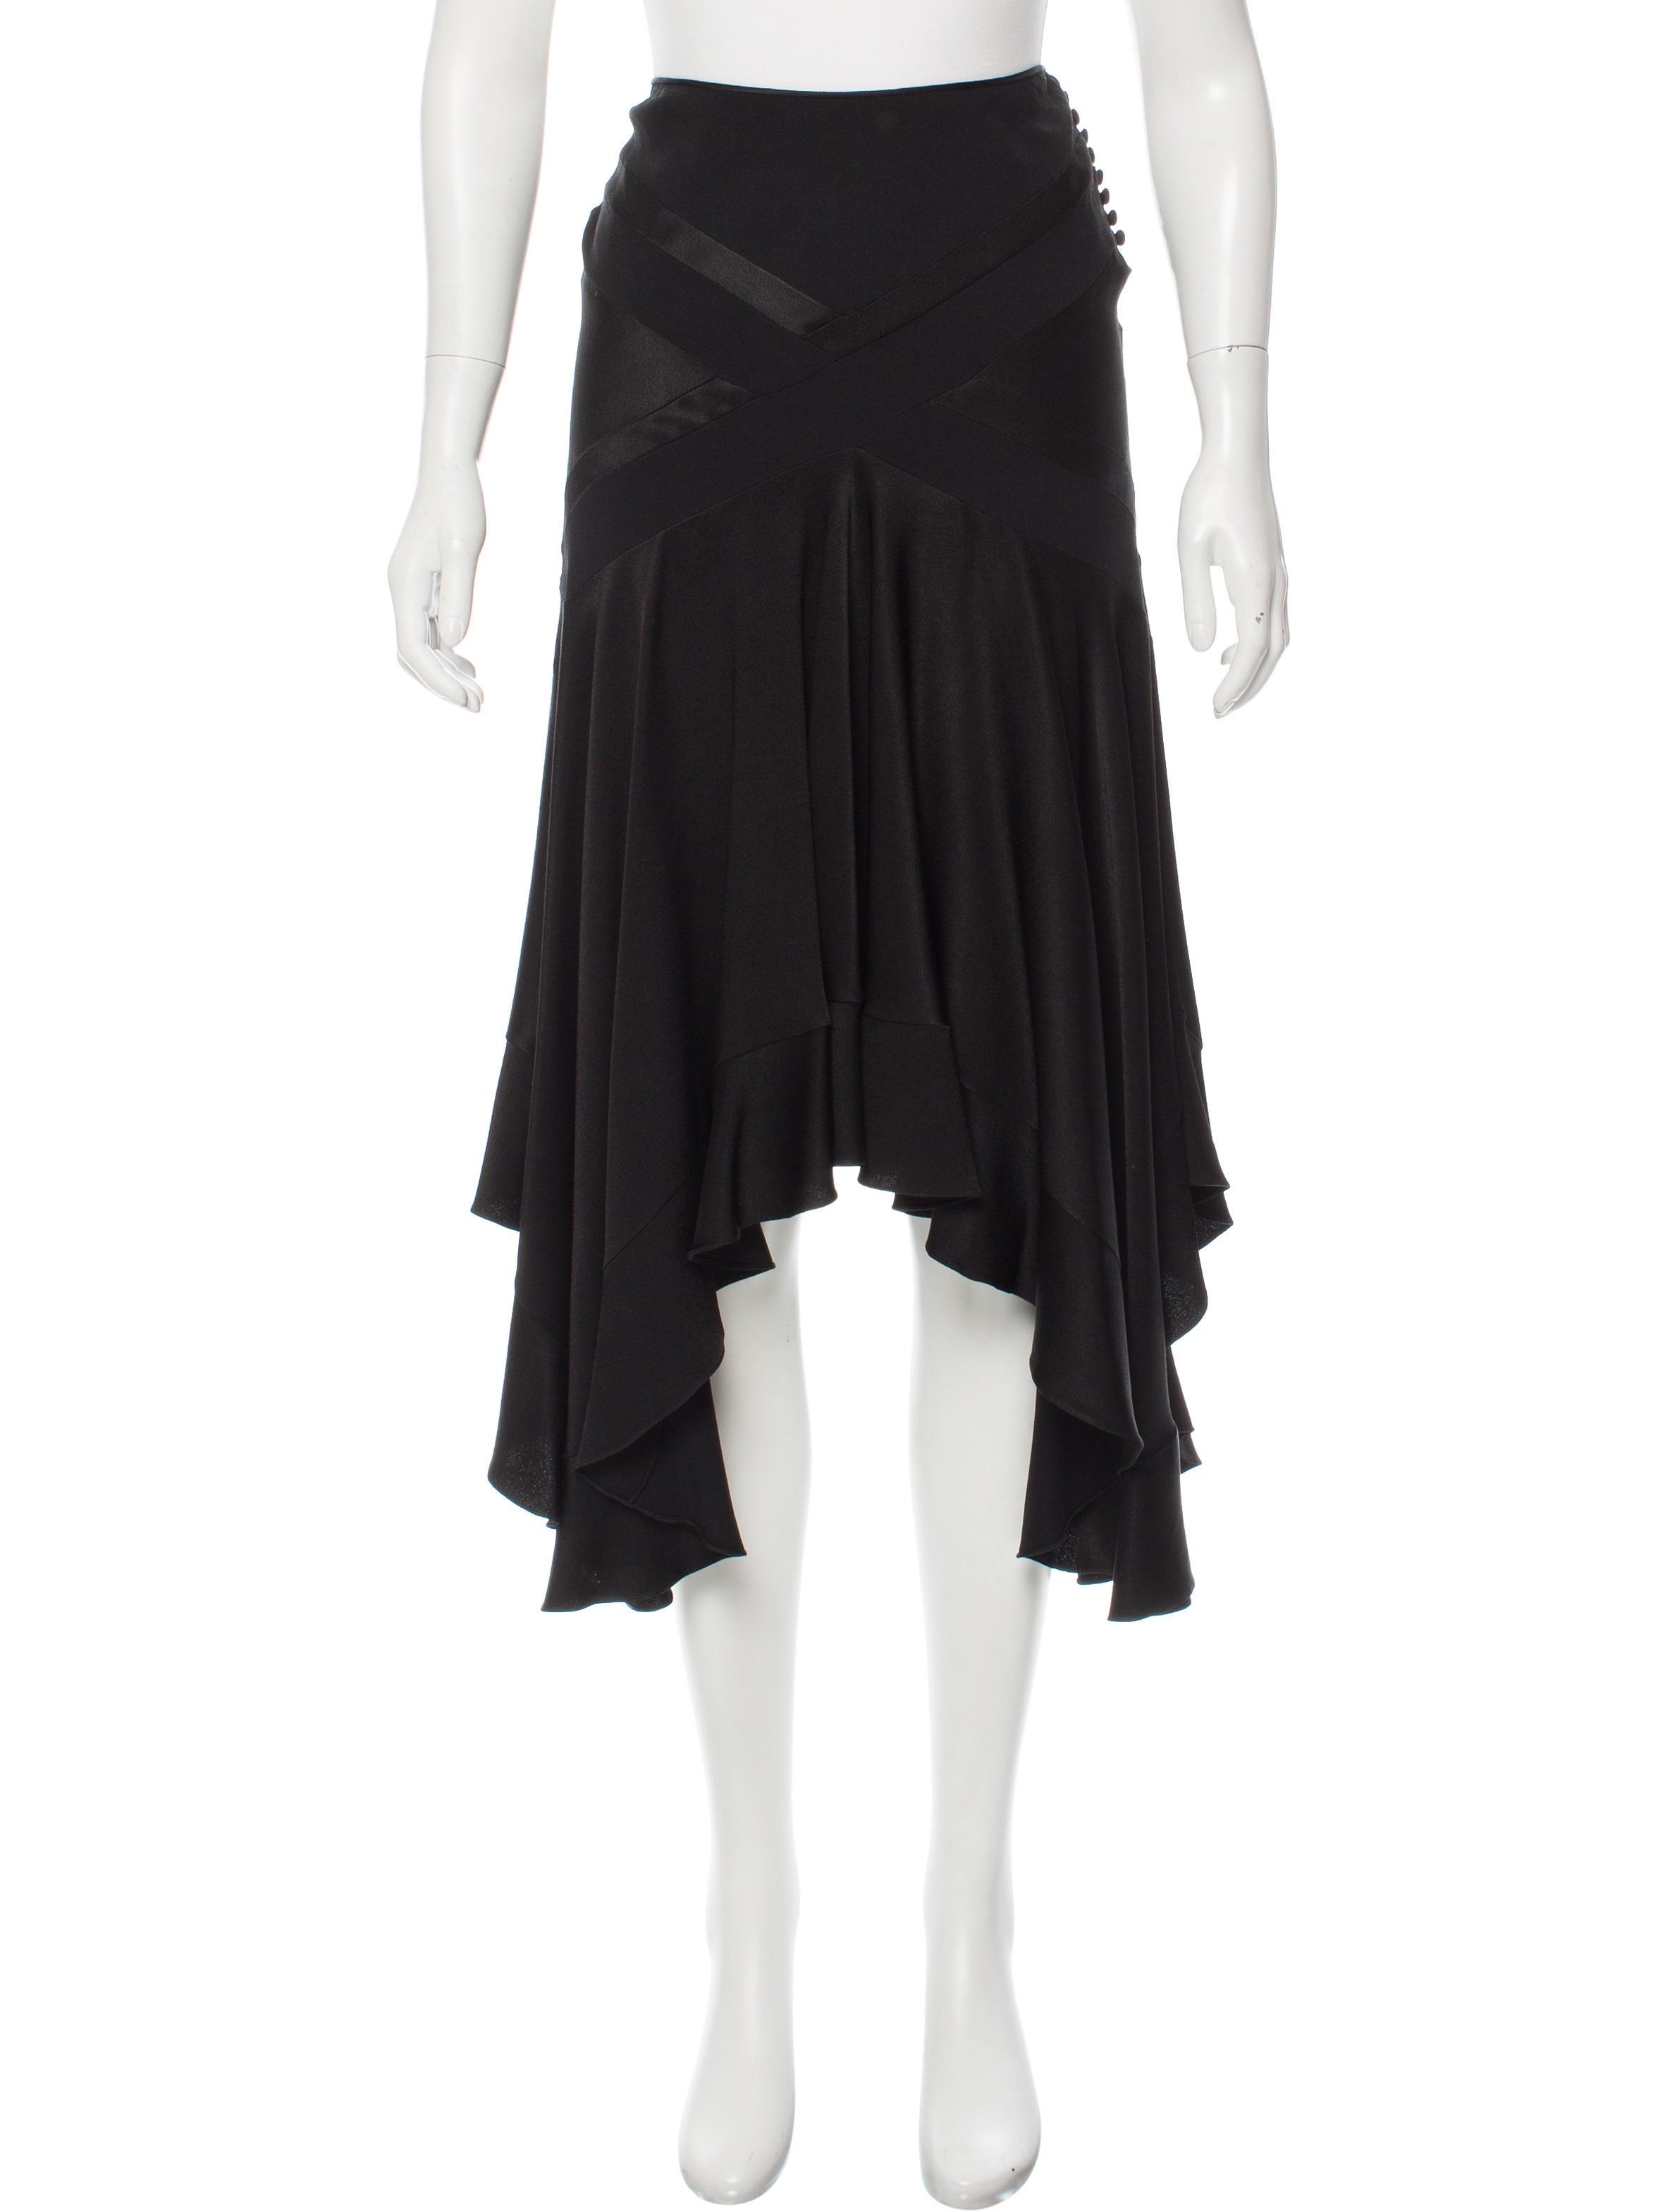 Christian Dior Asymmetrical Satin Skirt